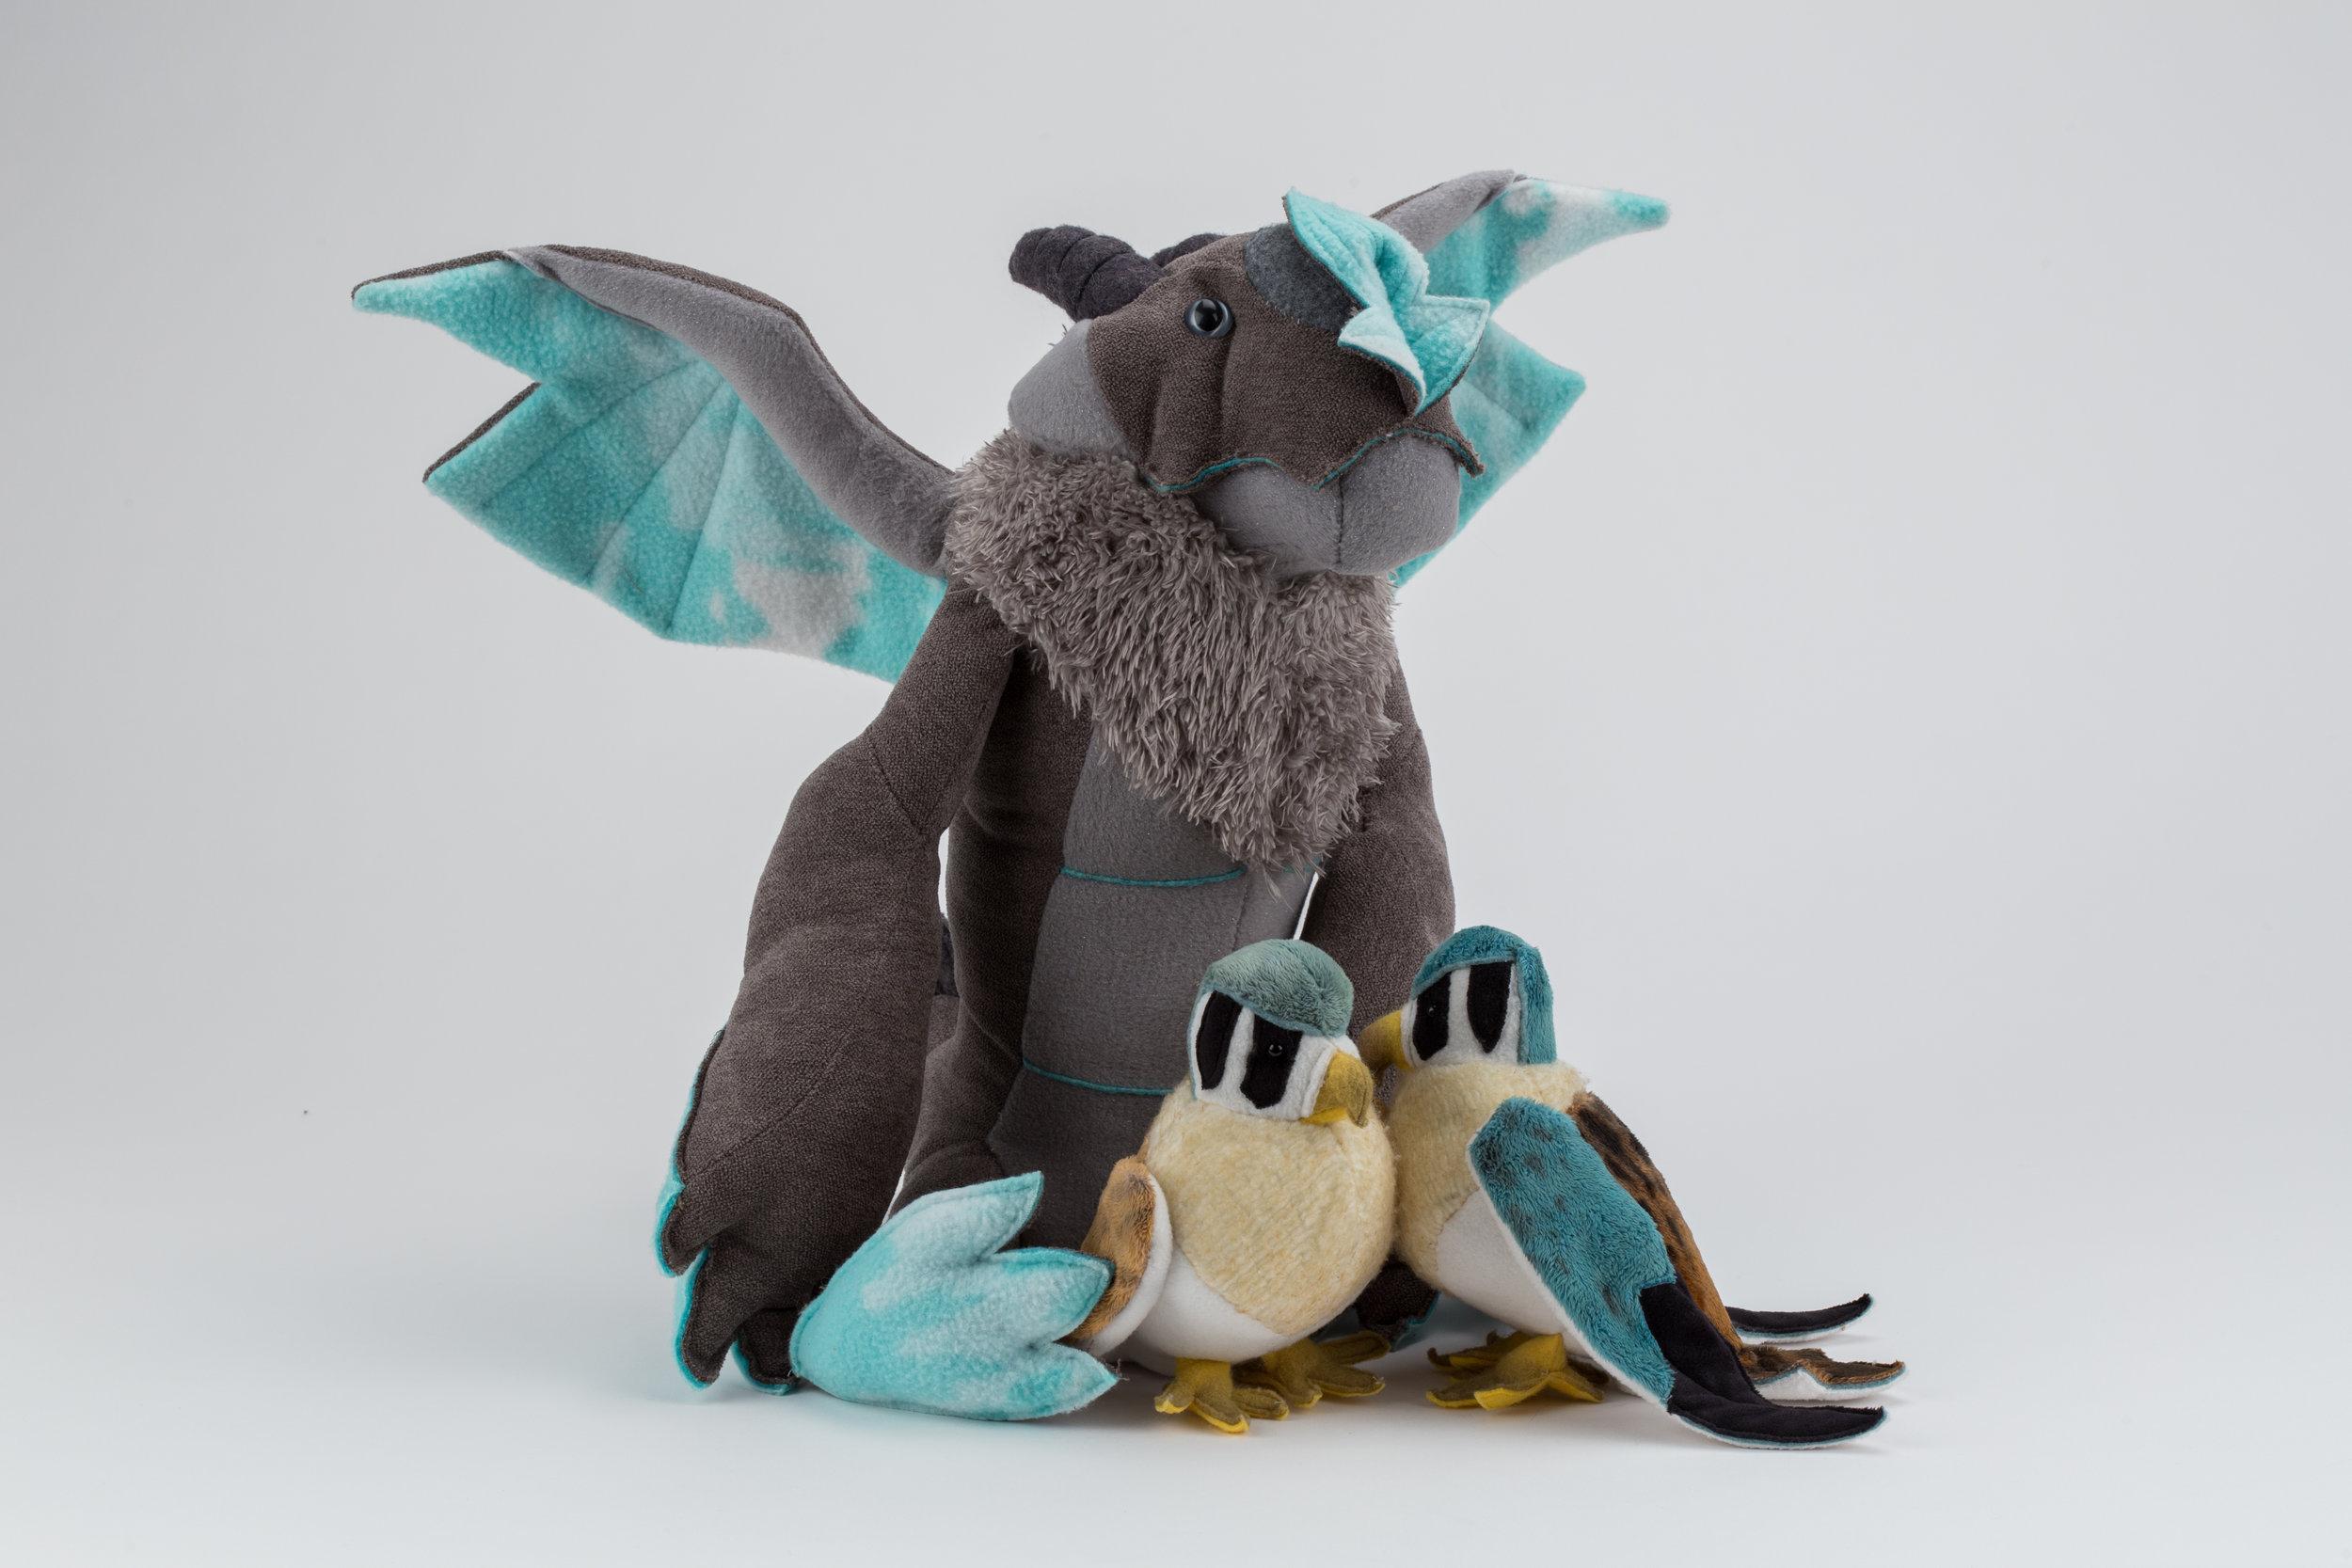 Original plush character Mica the Gargoyle